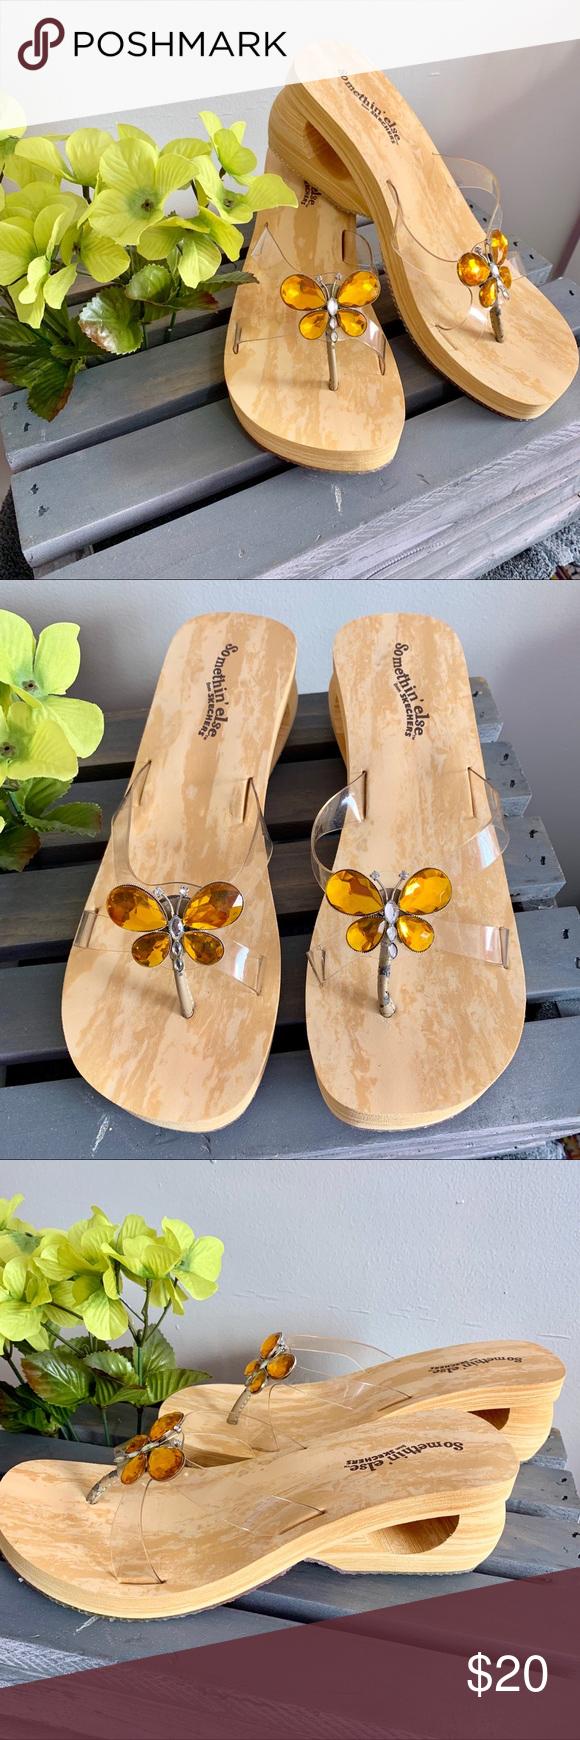 64bf961106e3 Skechers Somethin  Else Wedge Sandals Faux Wood Skechers Somethin  Else  Wedge Sandals. Foam